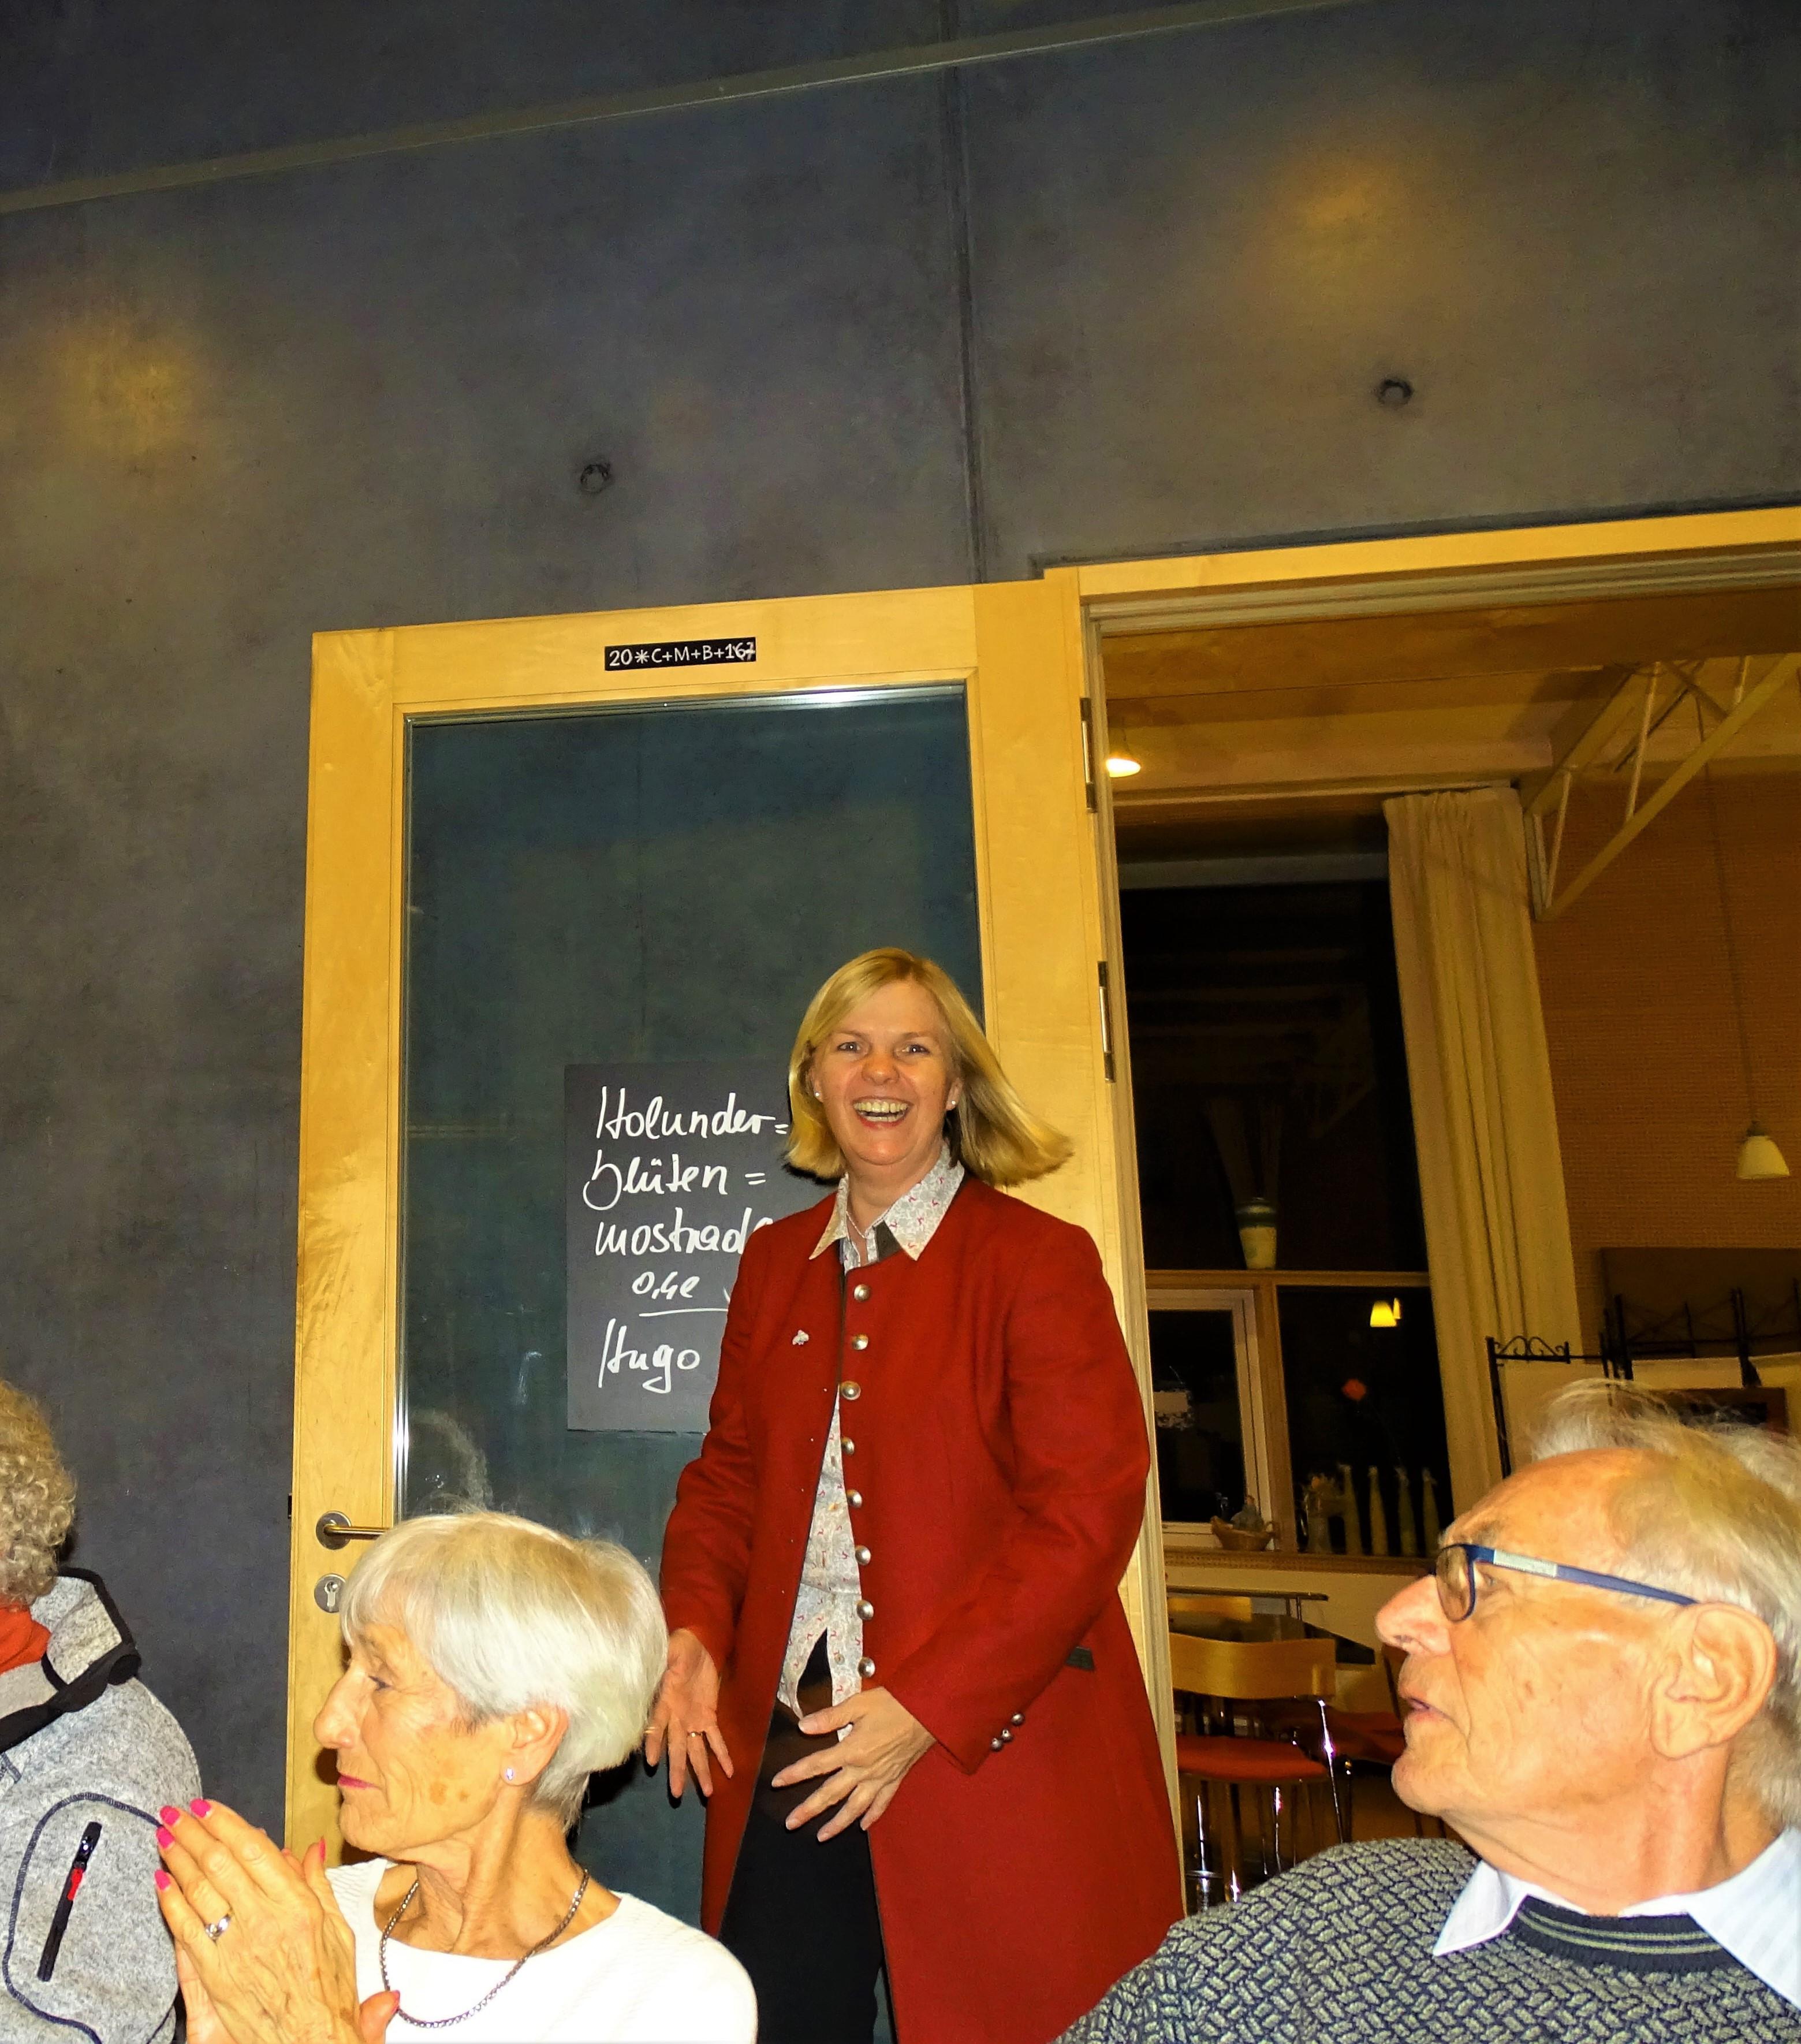 4-Vernissage-Artrium-Bad-Birnbach-Nadia-Baumgart-Feicht